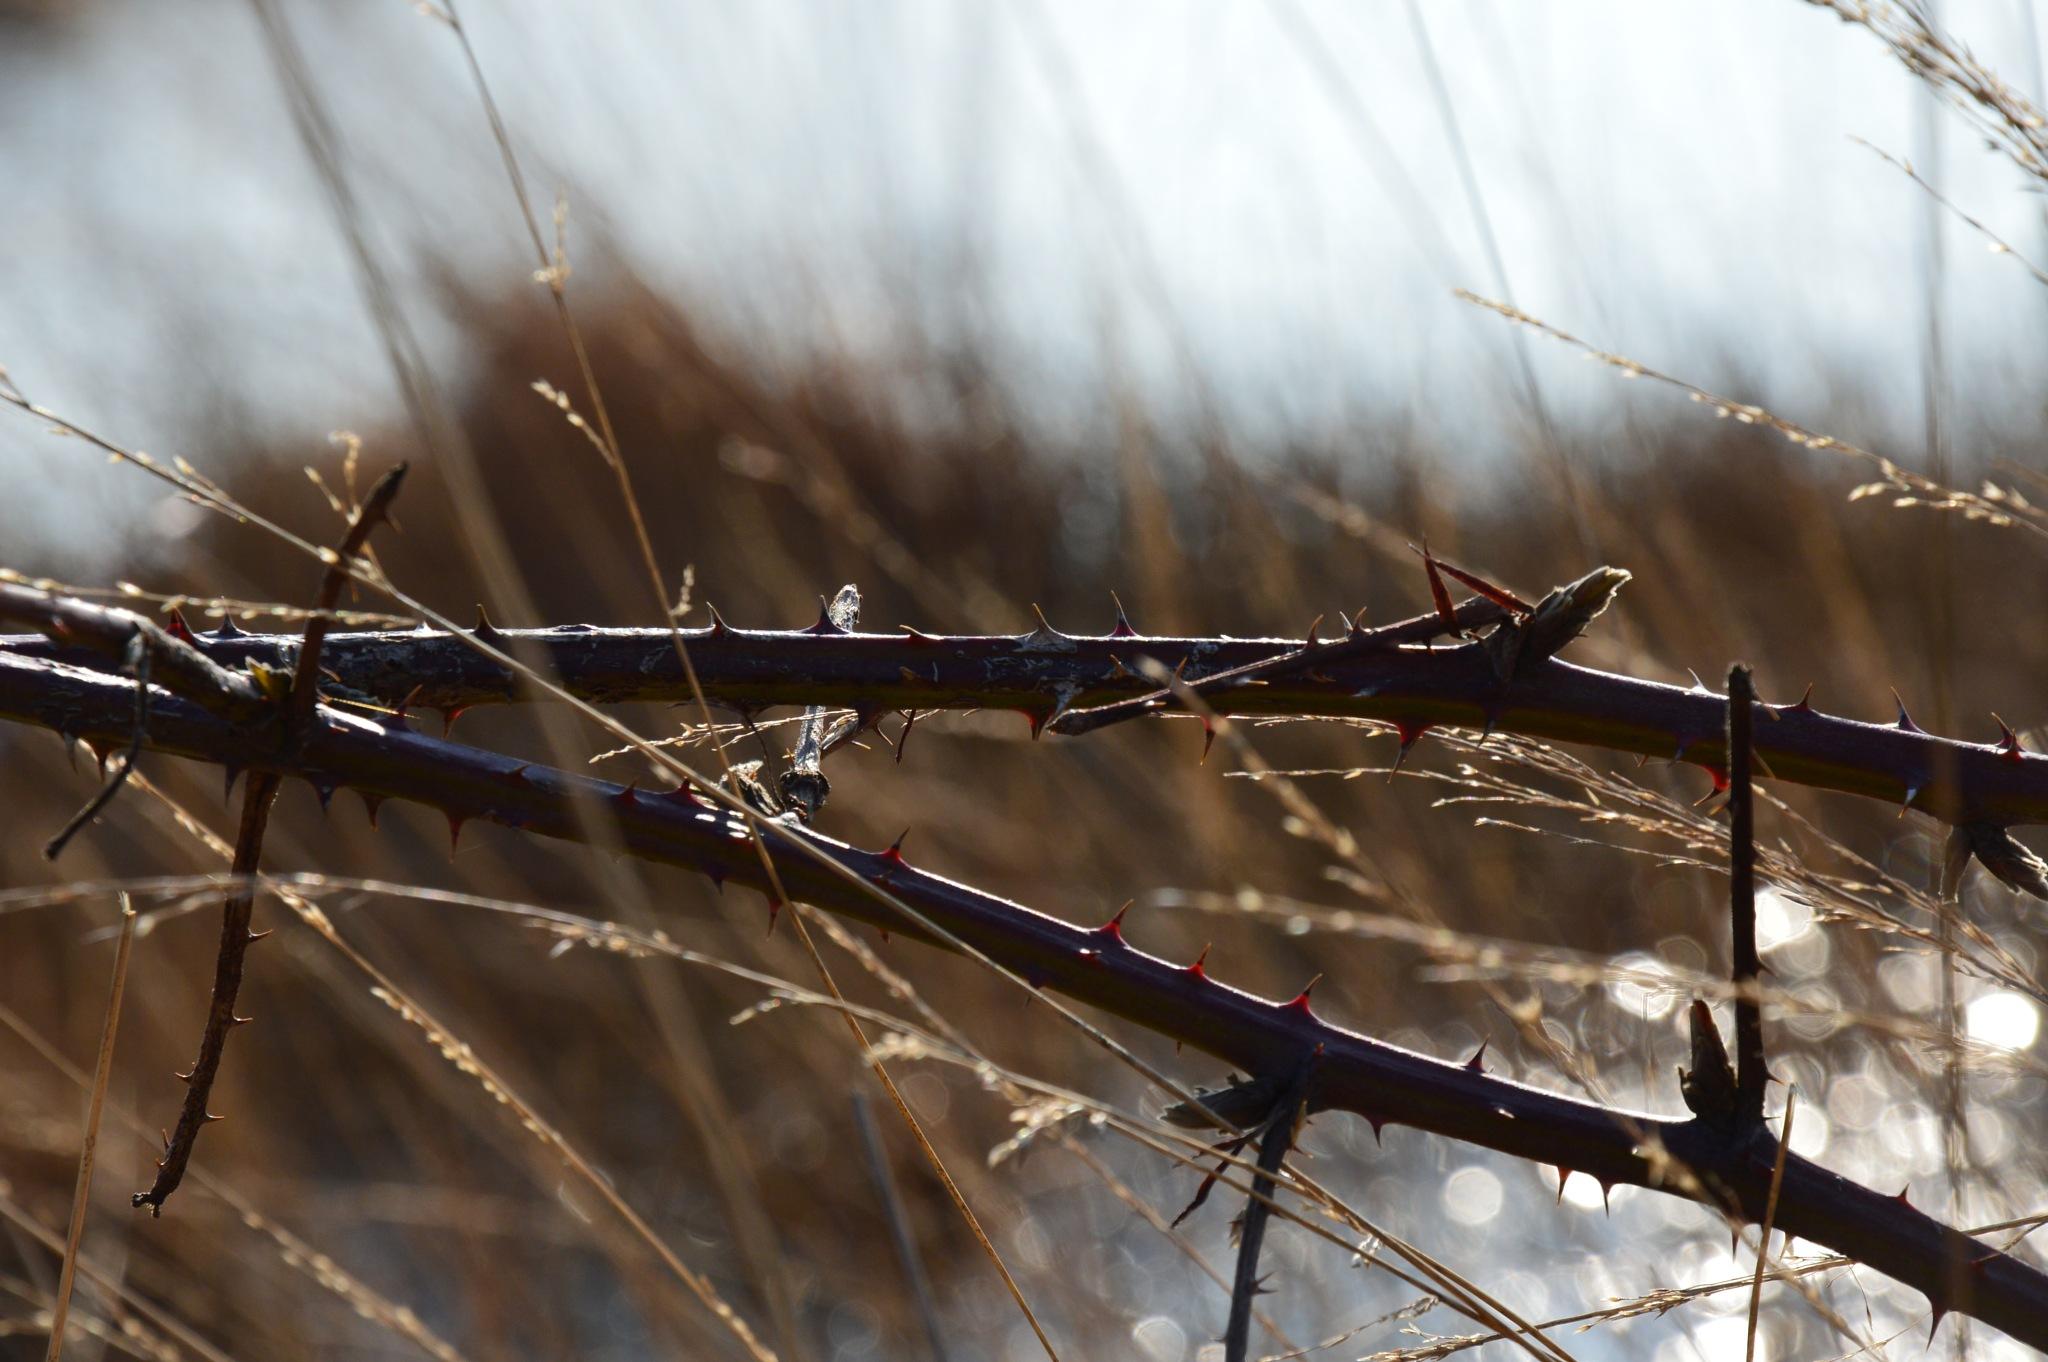 Thorns by Roanne Frerejean